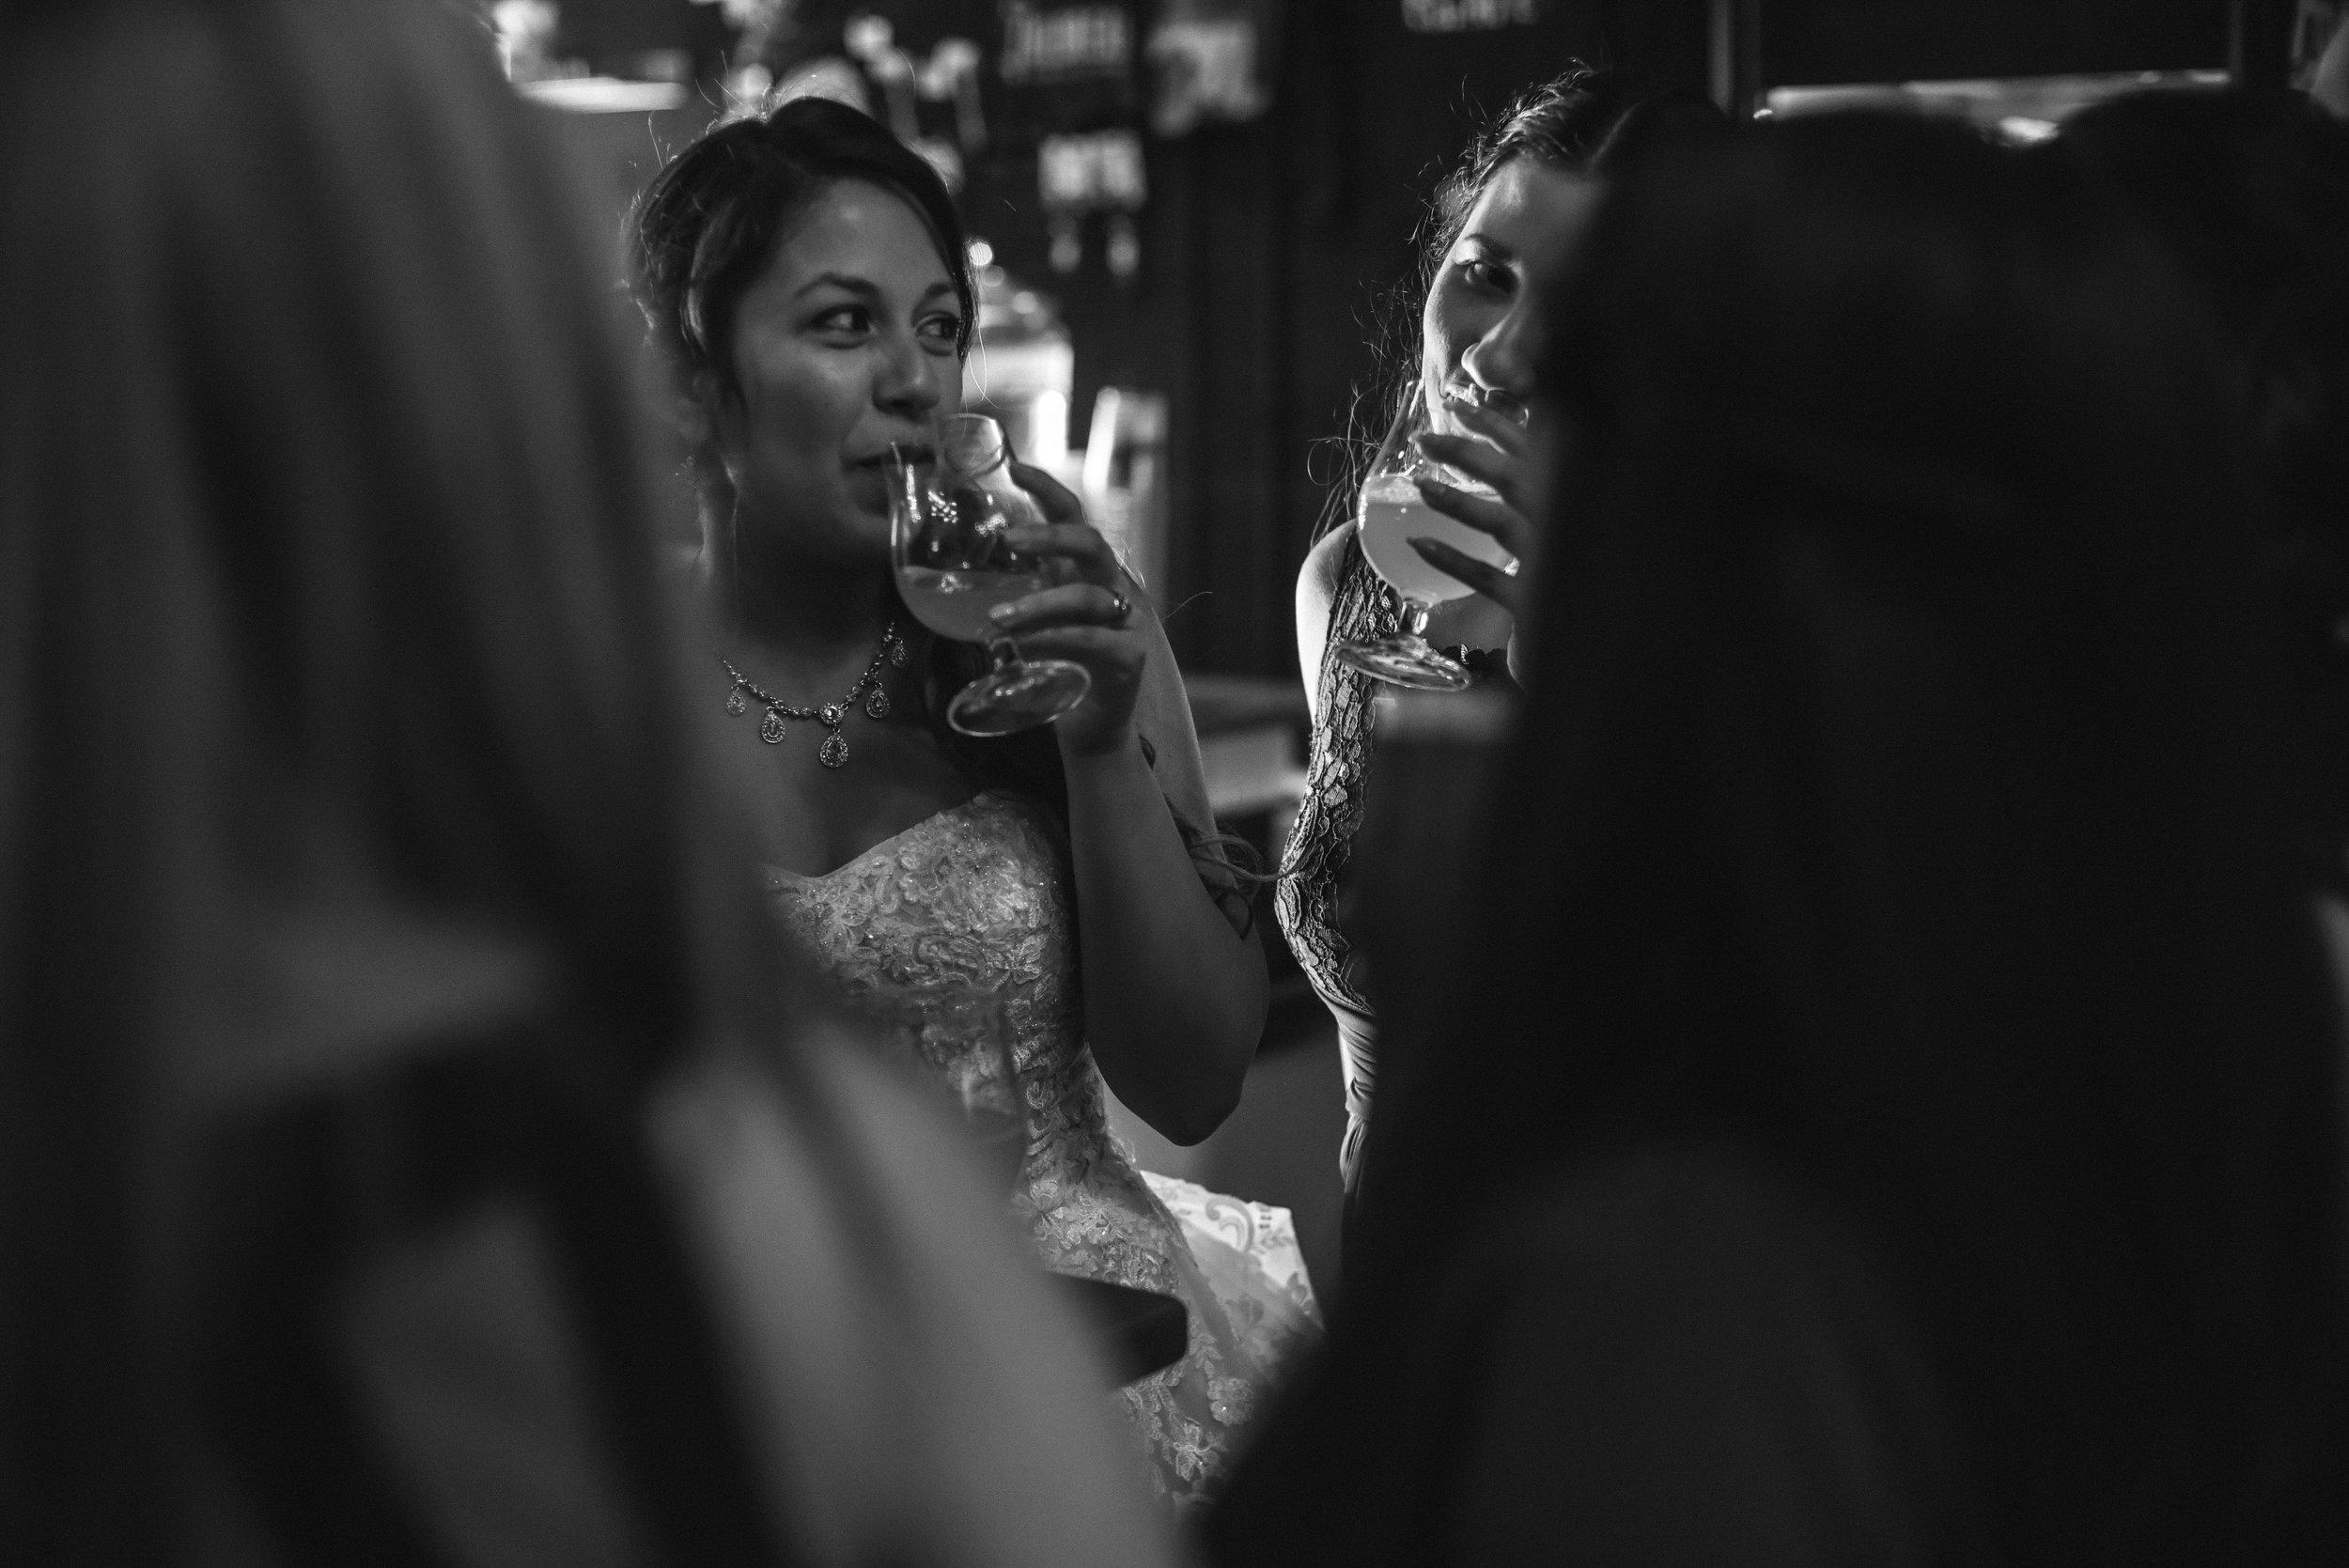 maryland_wedding_photographer_jailbreak_brewing_company-132.jpg